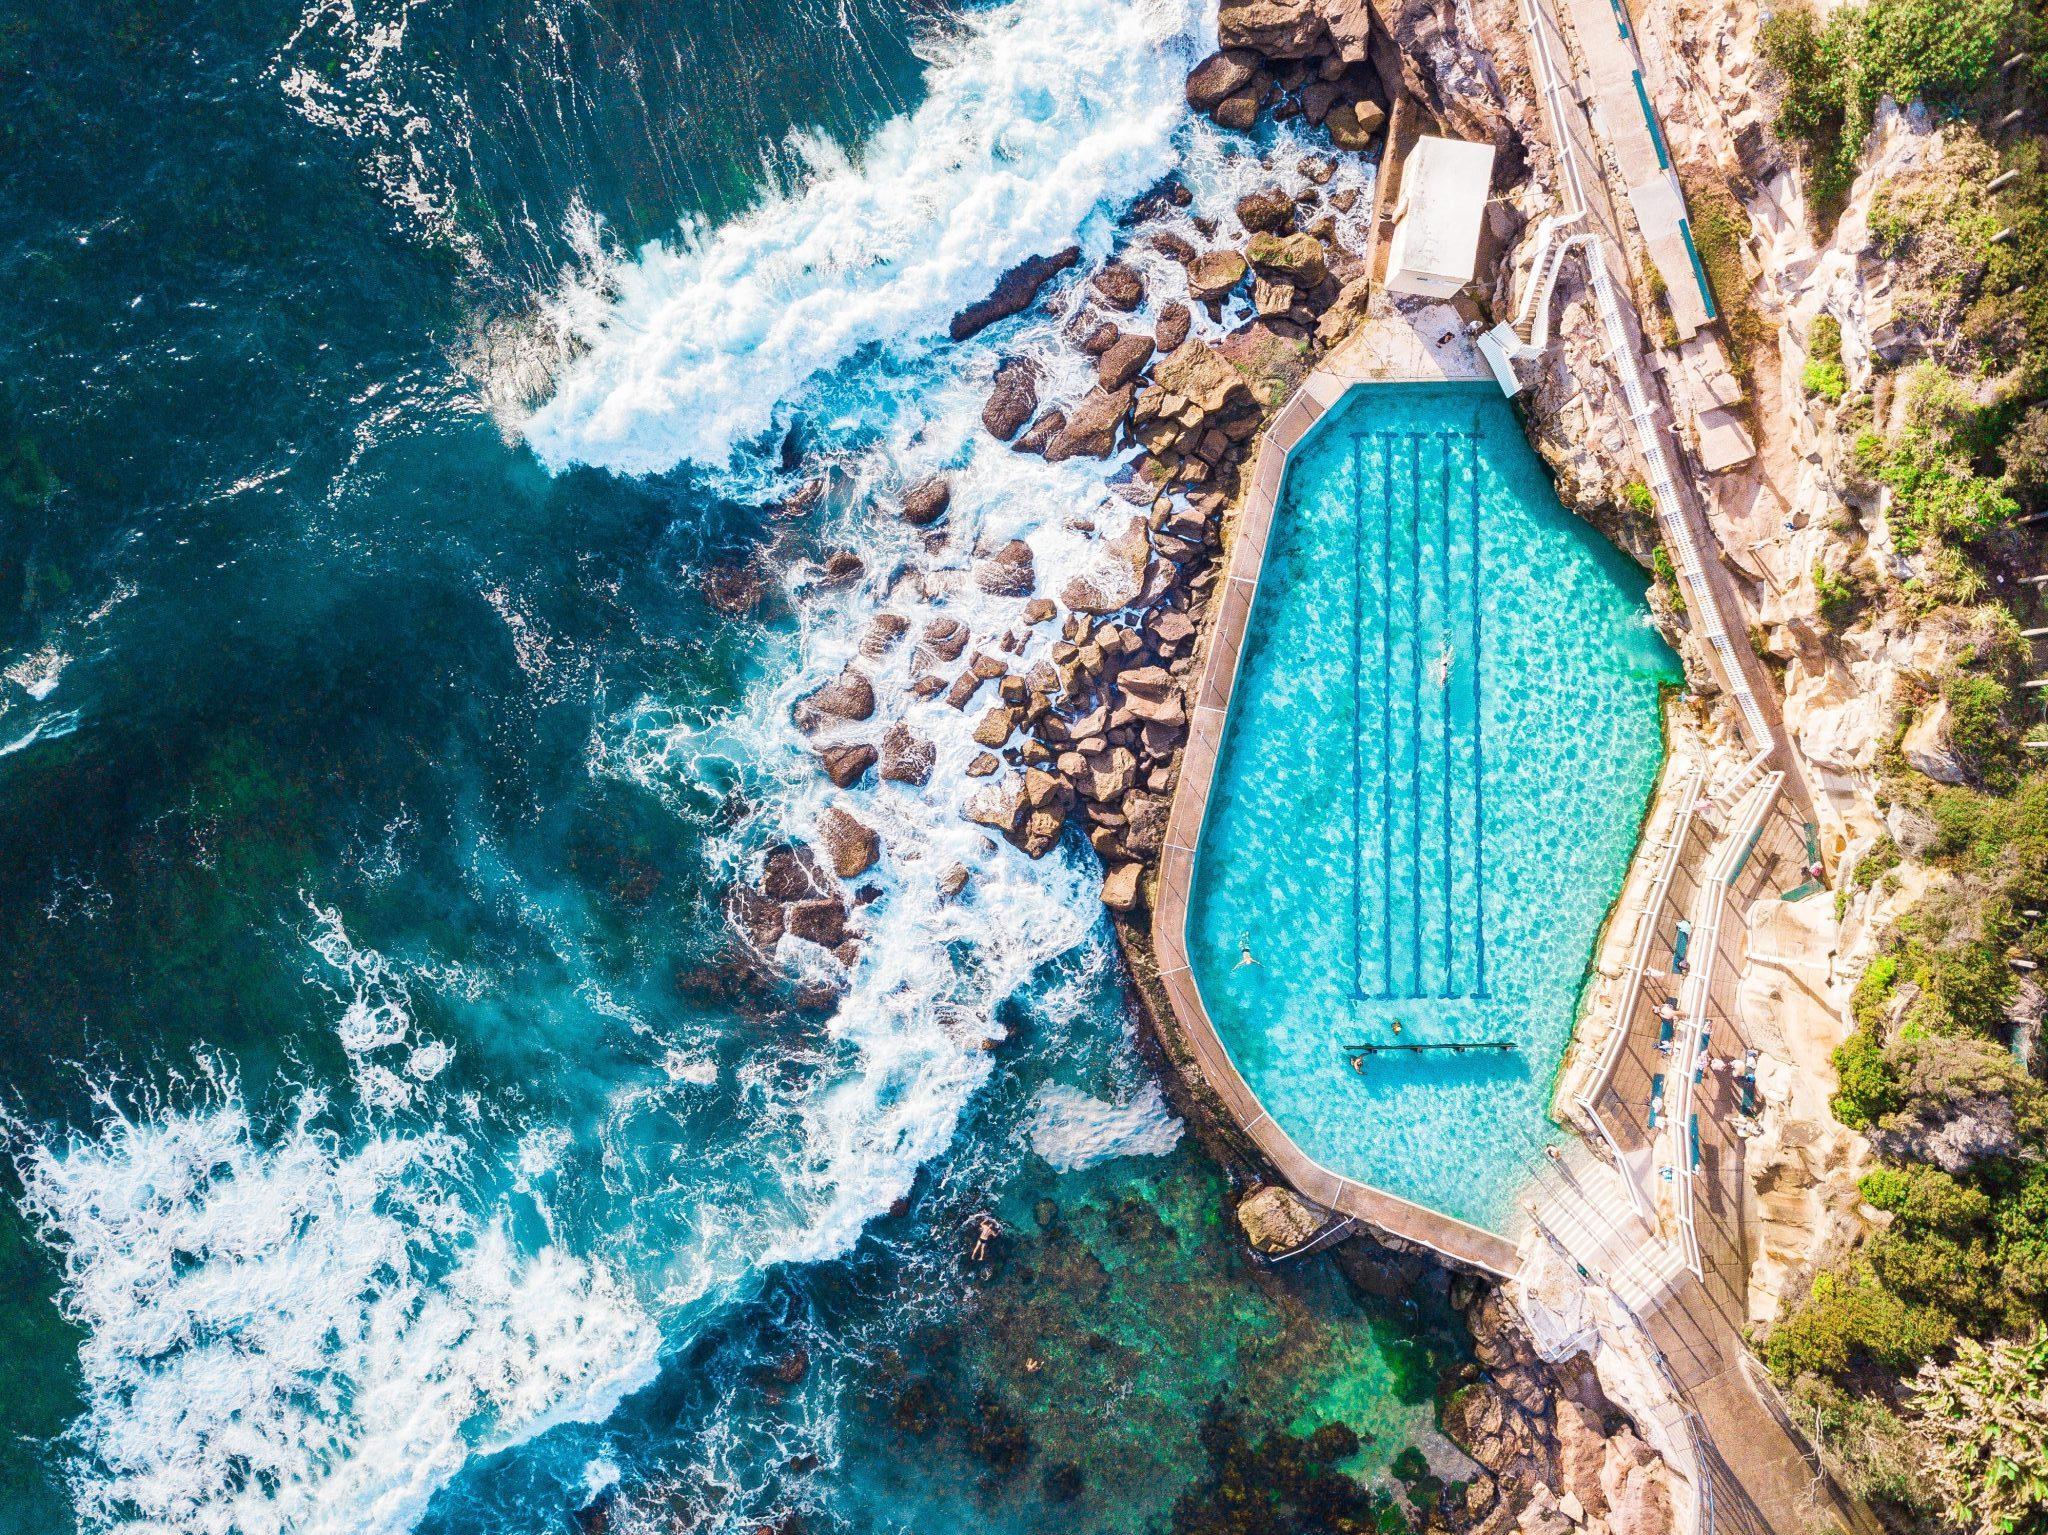 ocean pool australia aerial view